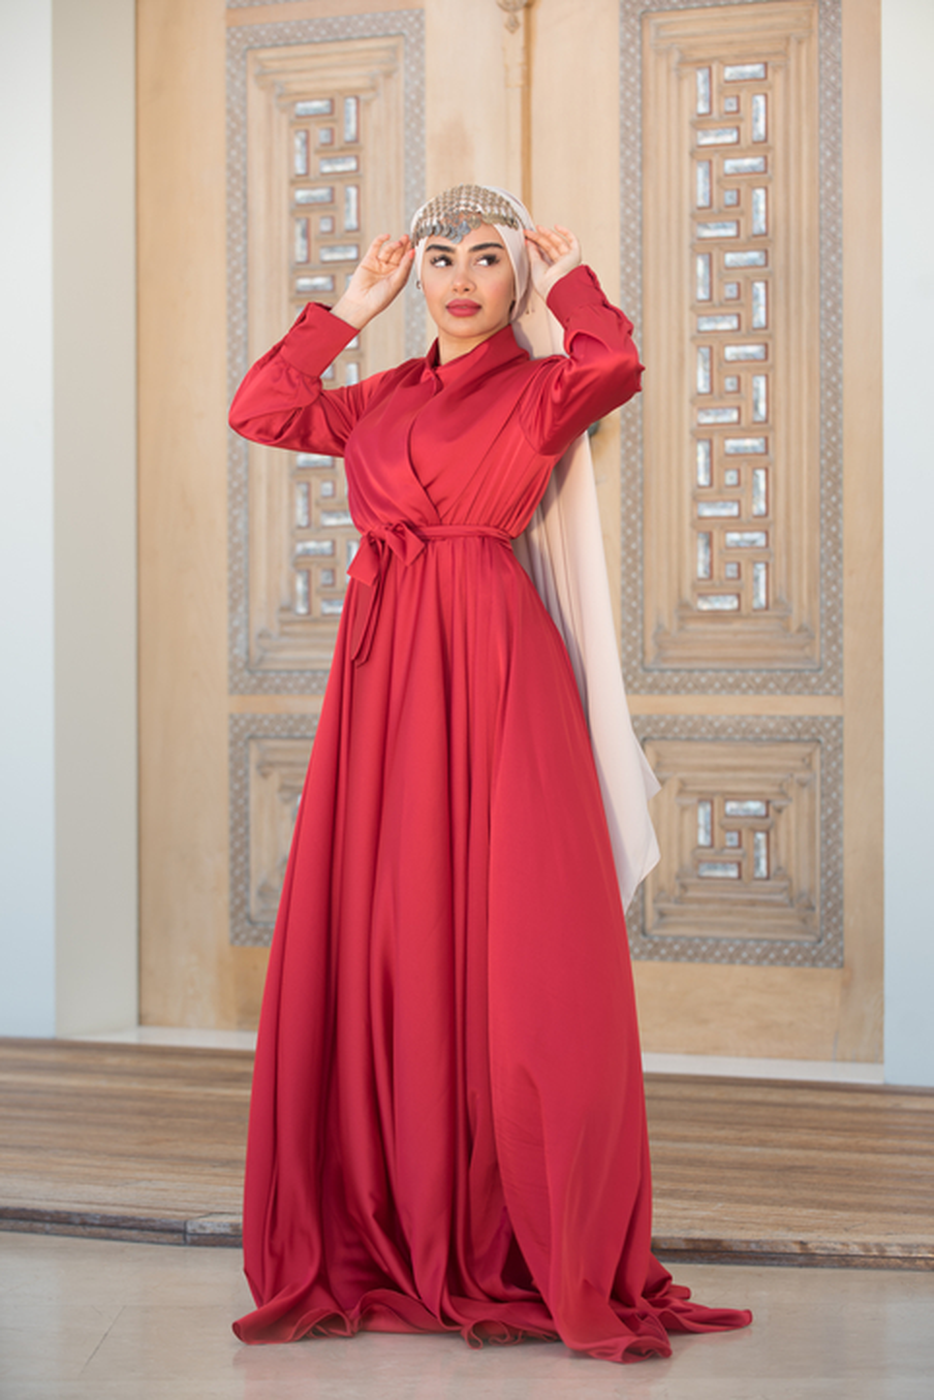 Red Mennel Dress